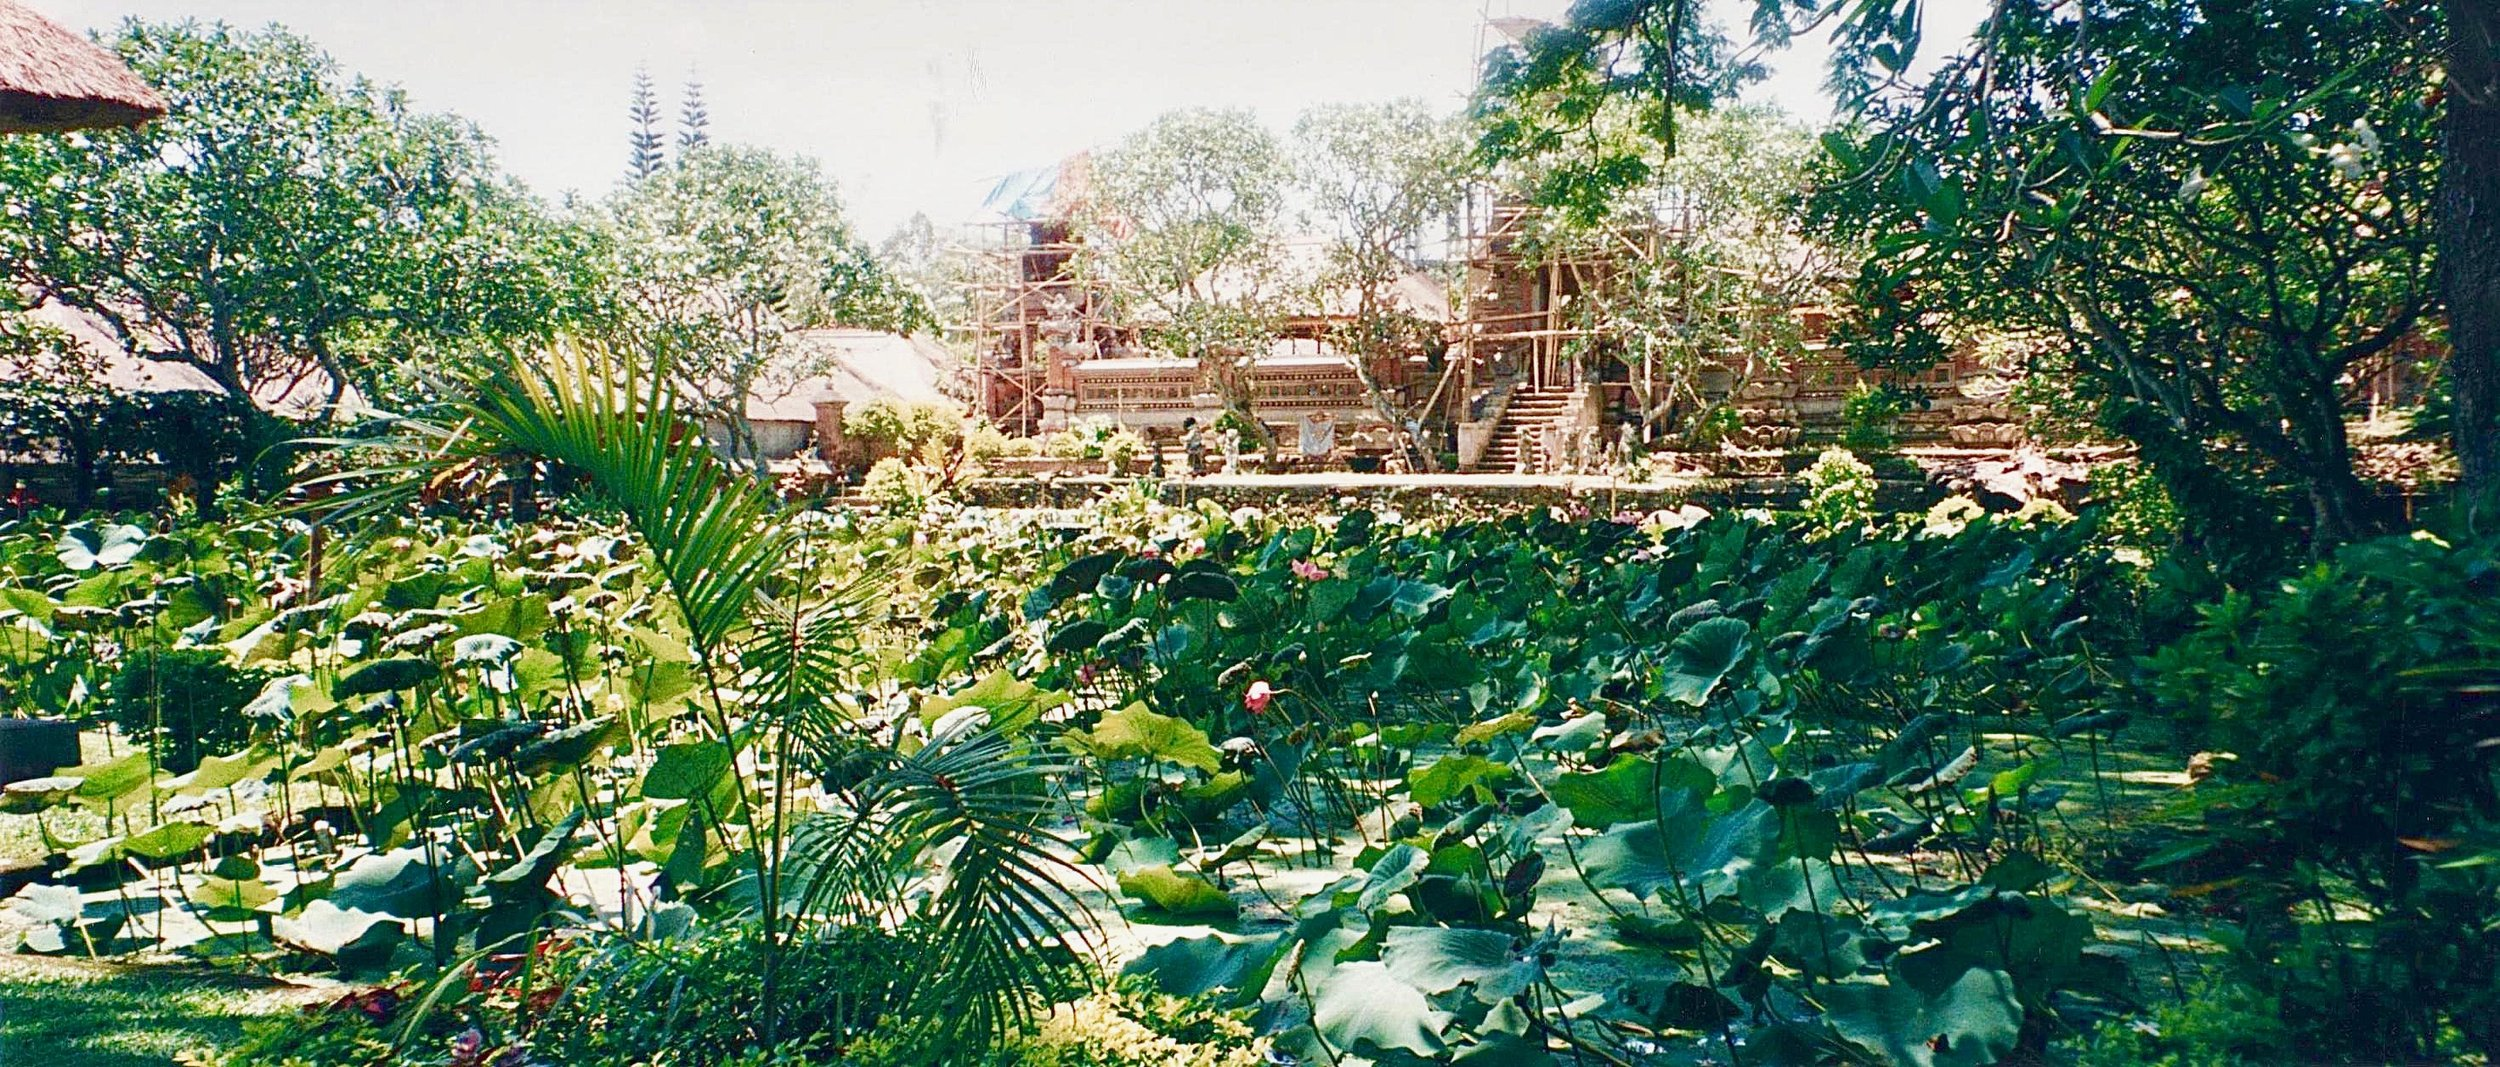 Bali Ubud lily pond 2.jpg